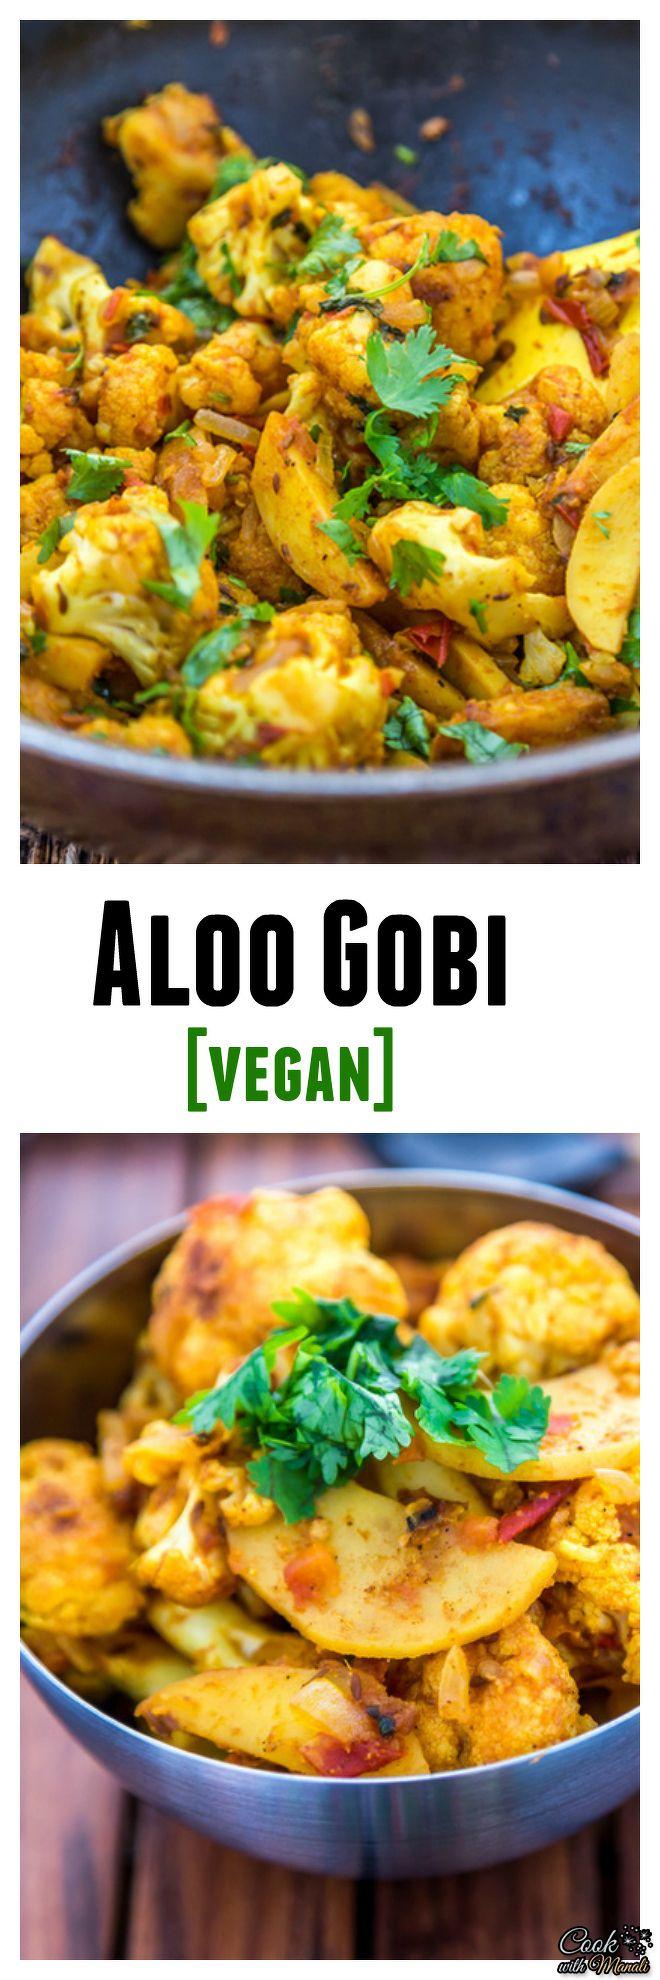 Best 25+ Indian cauliflower ideas on Pinterest